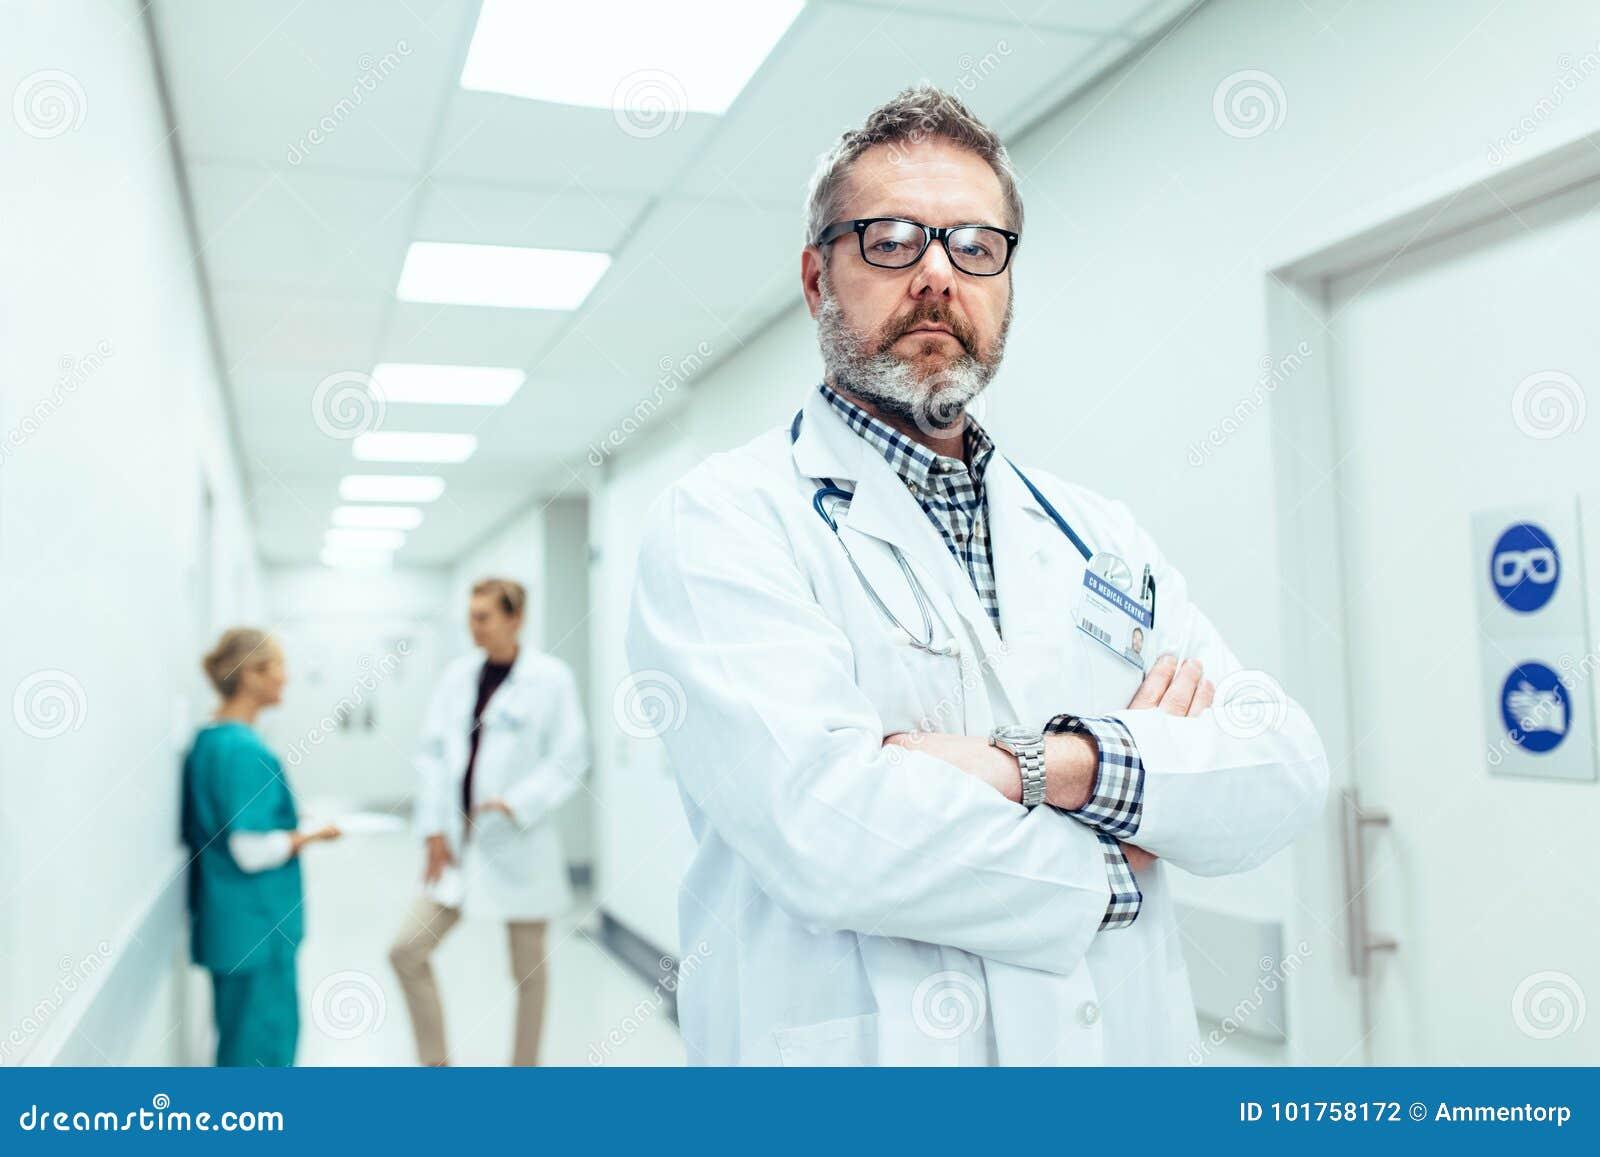 Experienced doctor standing in hospital corridor